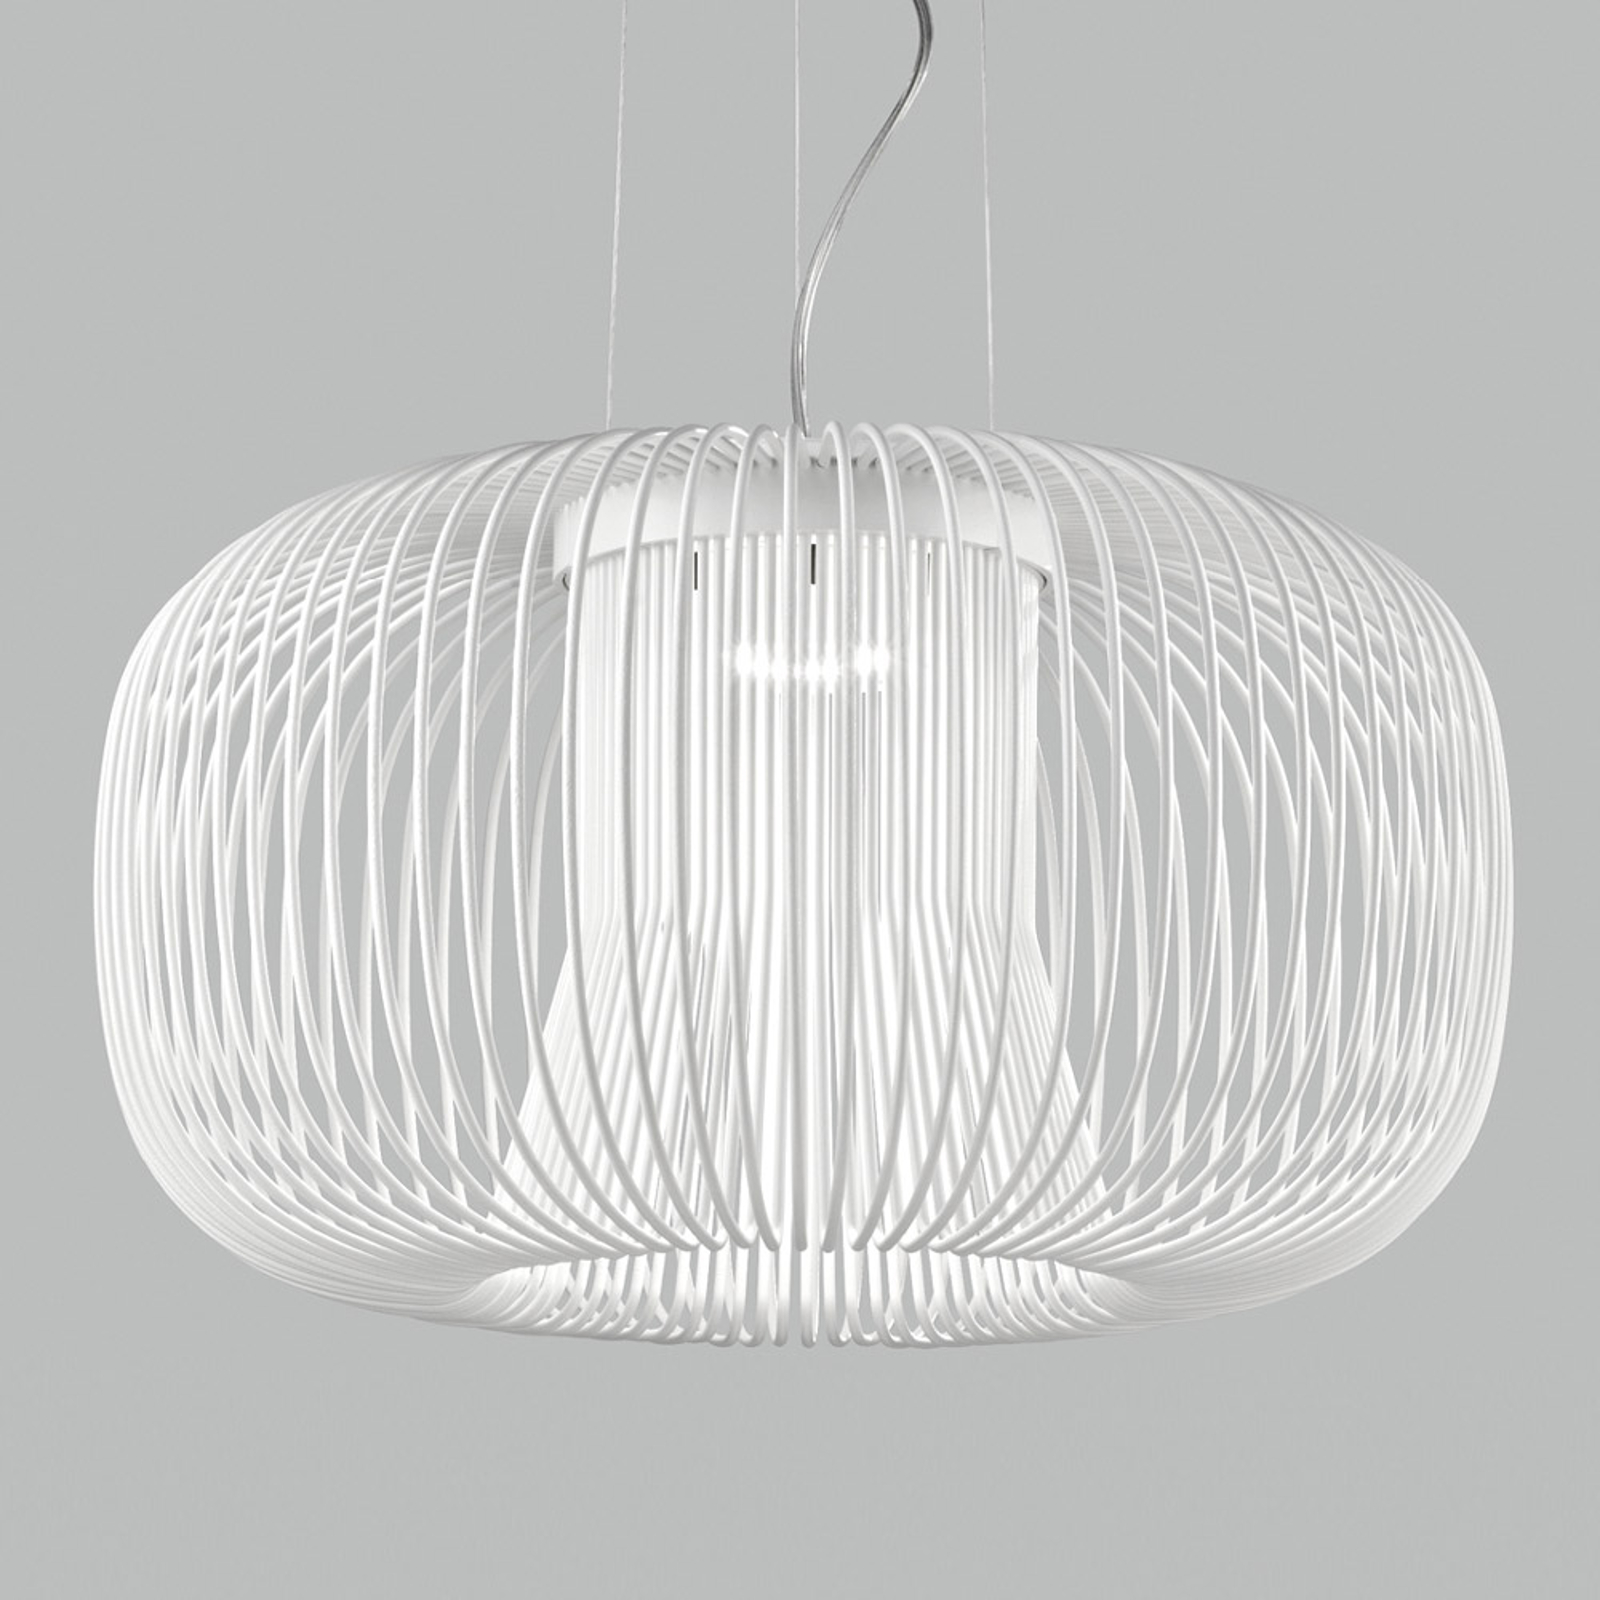 LED-Hängelampe Impossible C